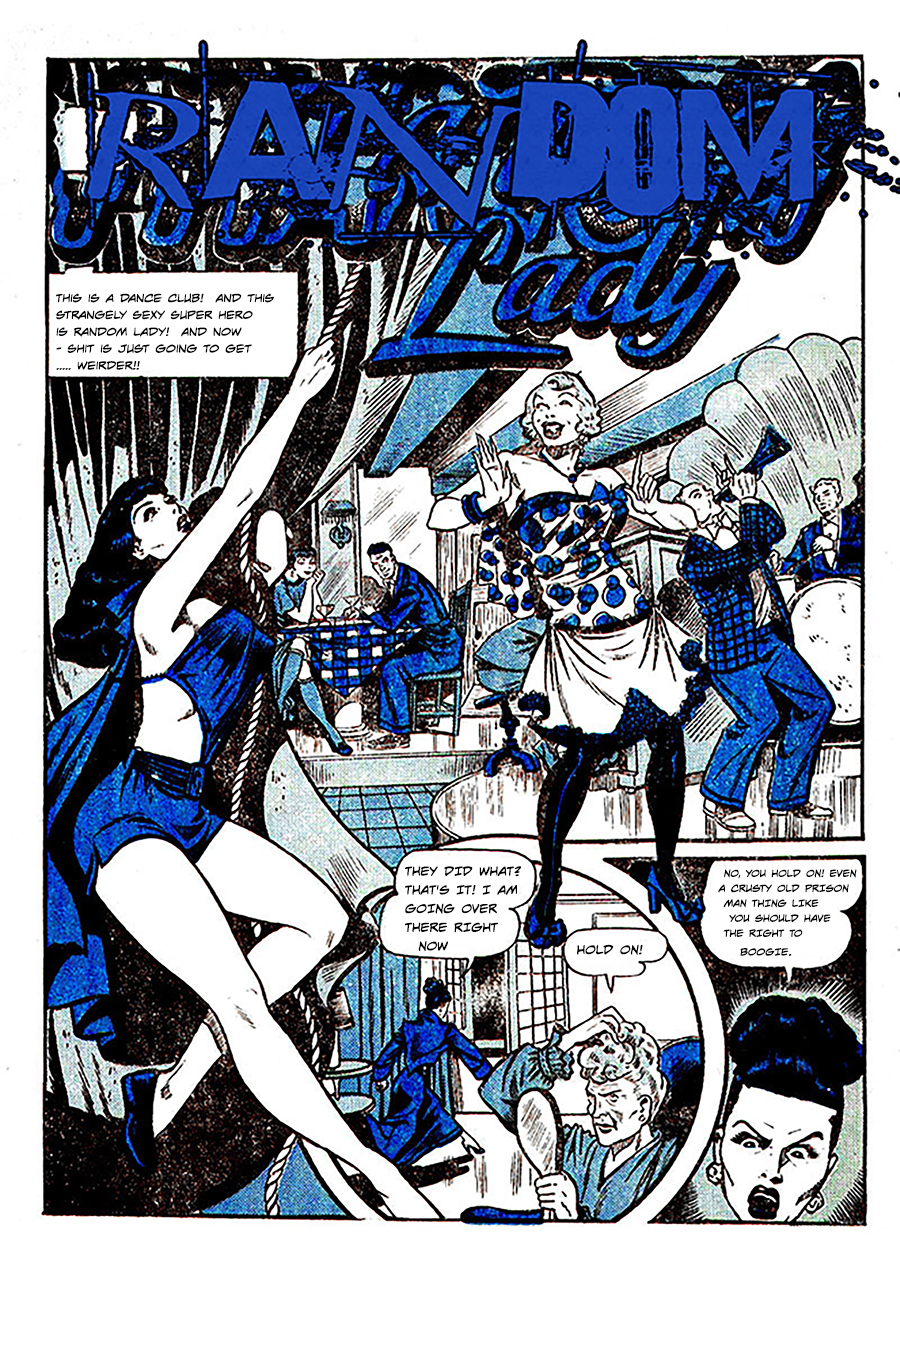 Random Lady – Prison-man-lady Page 1